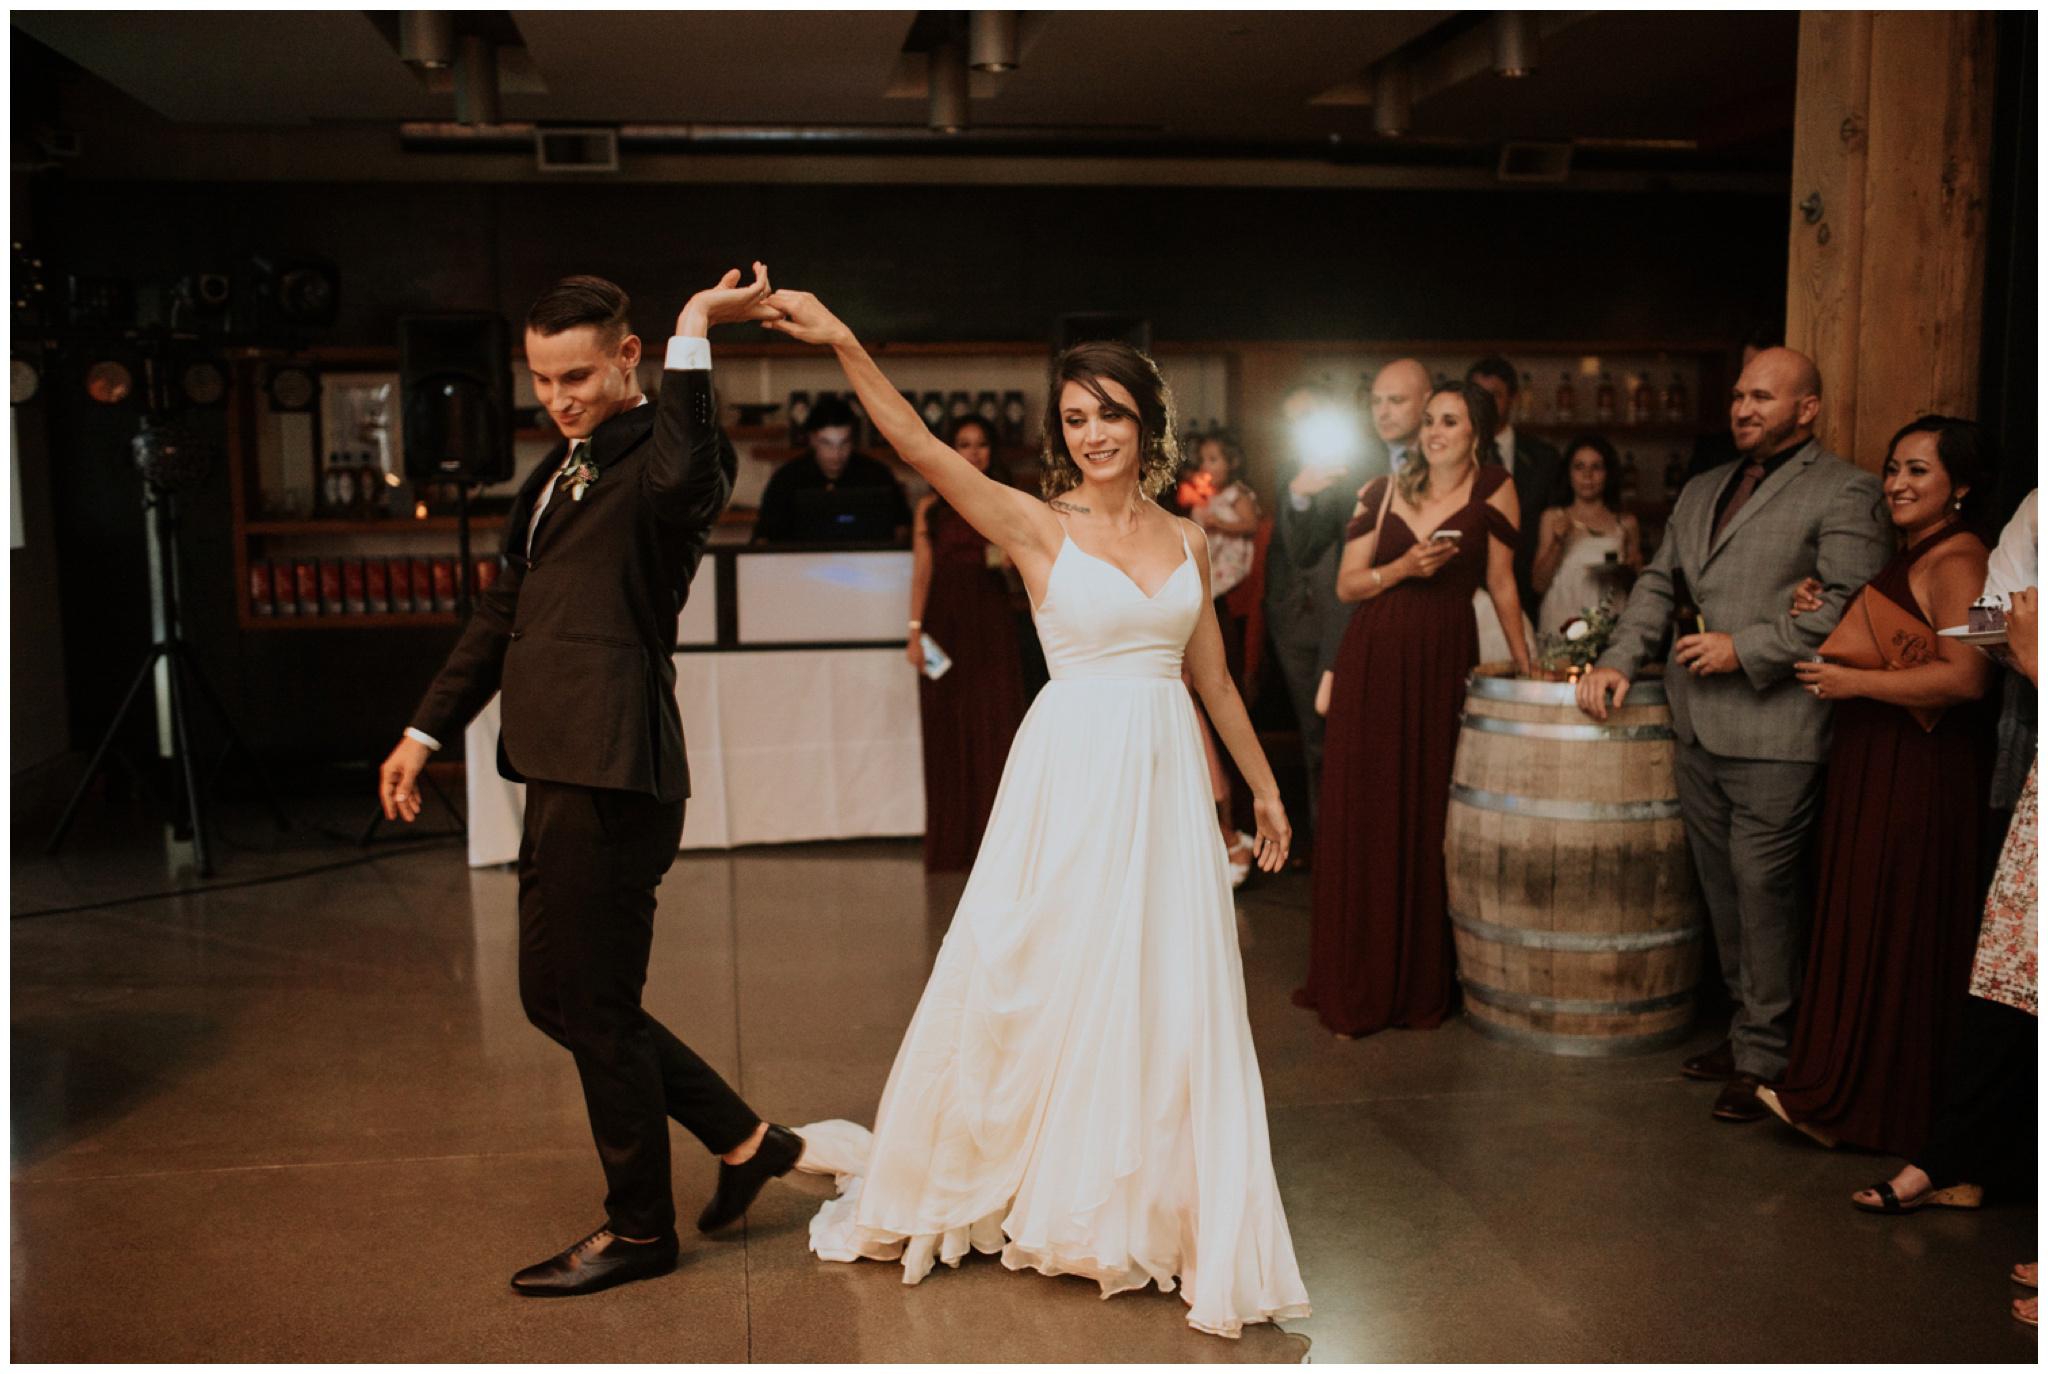 alyssa-keiran-westland-distillery-urban-seattle-wedding-photographer-caitlyn-nikula-148.jpg